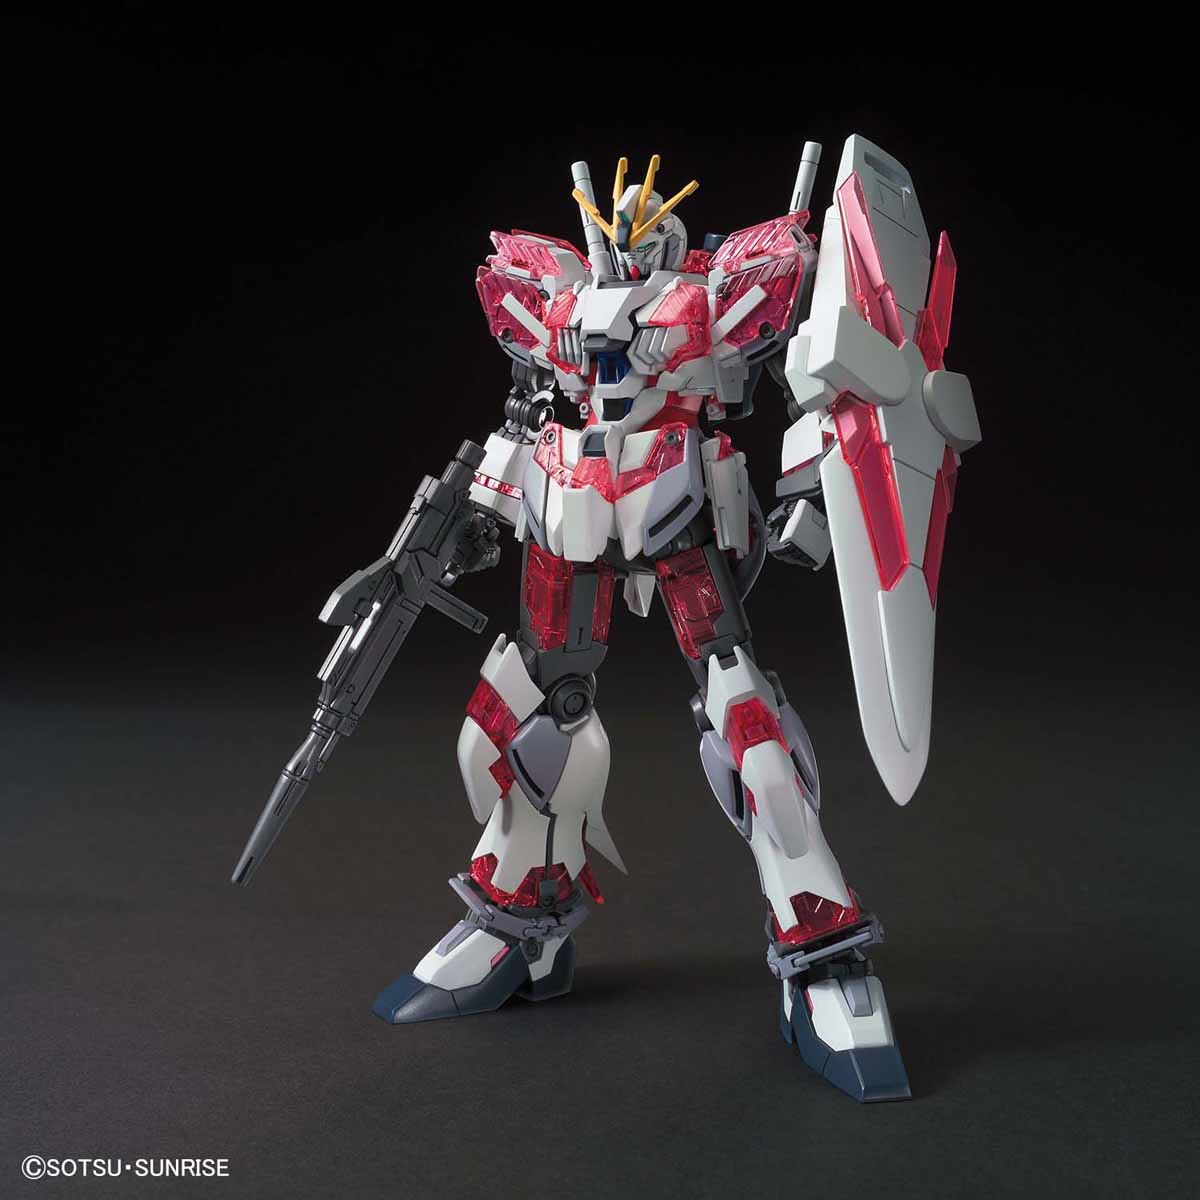 RX-9 ナラティブガンダム(C装備)[Narrative Gundam C-Packs]